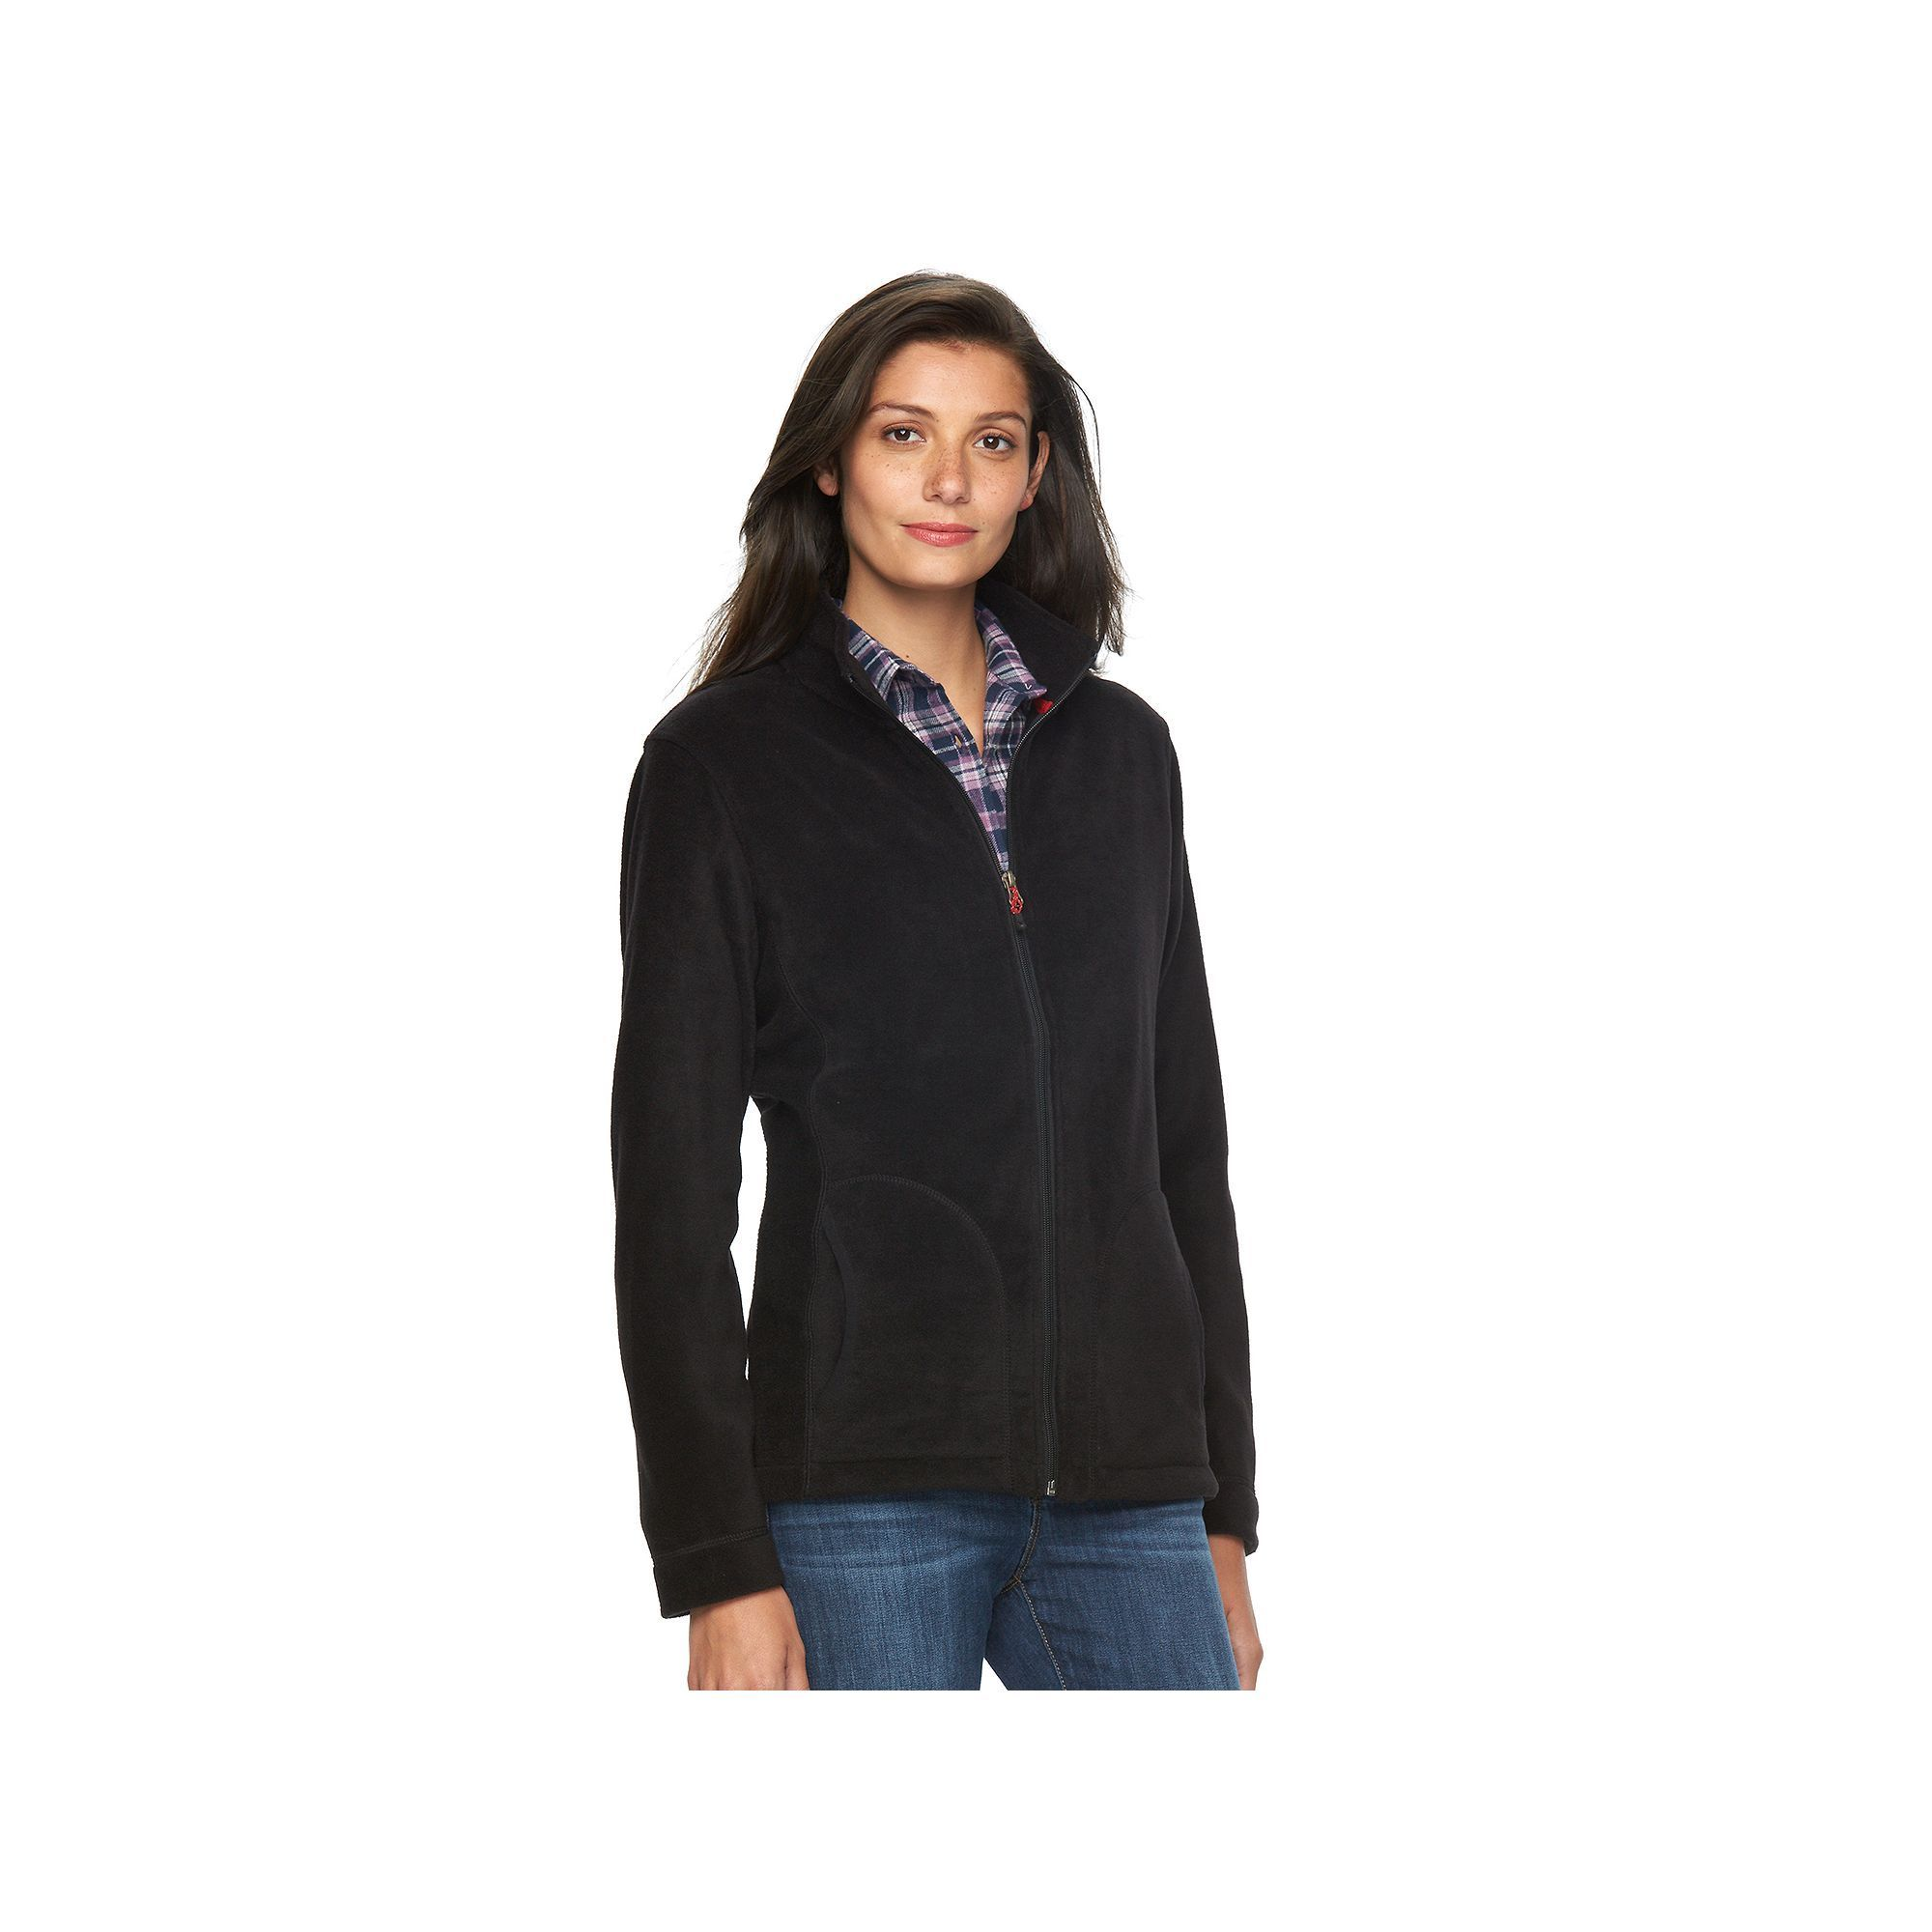 Womenus woolrich andes fleece jacket light grey products fleece